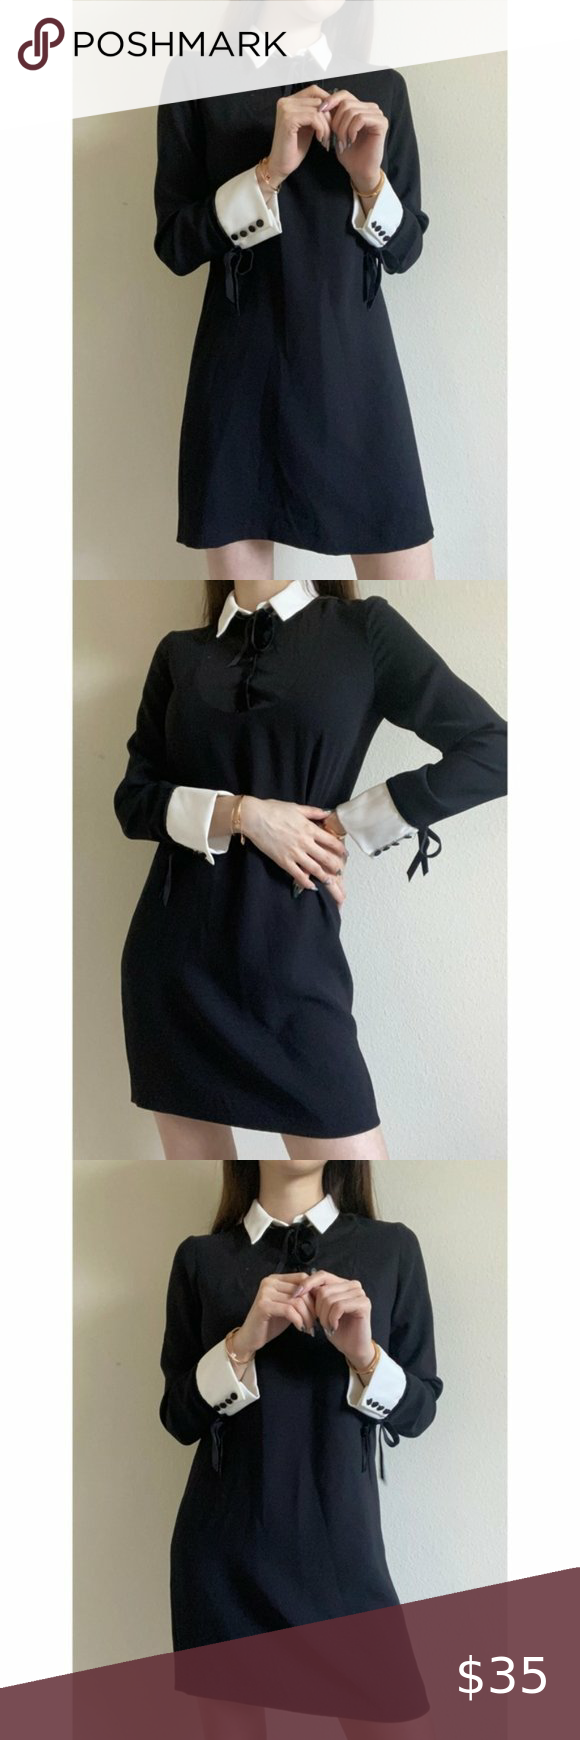 Zara Black Long Sleeve White Collar Mini Dress White Long Sleeve Womens Black Dress Black Long Sleeve [ 1740 x 580 Pixel ]